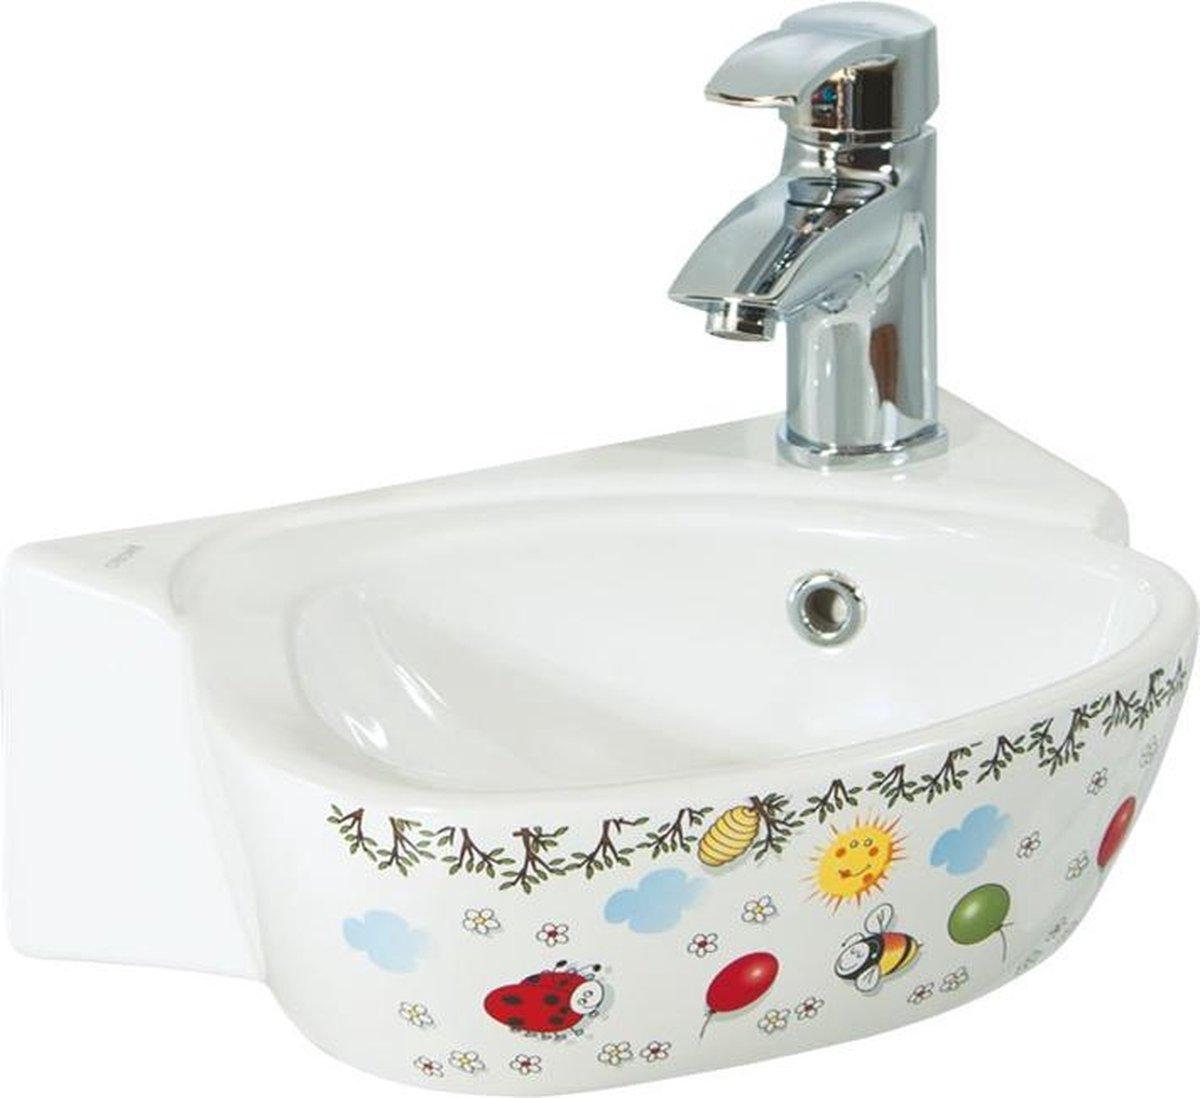 Creavit CK035 Kinderbadkamer Wastafel Wit